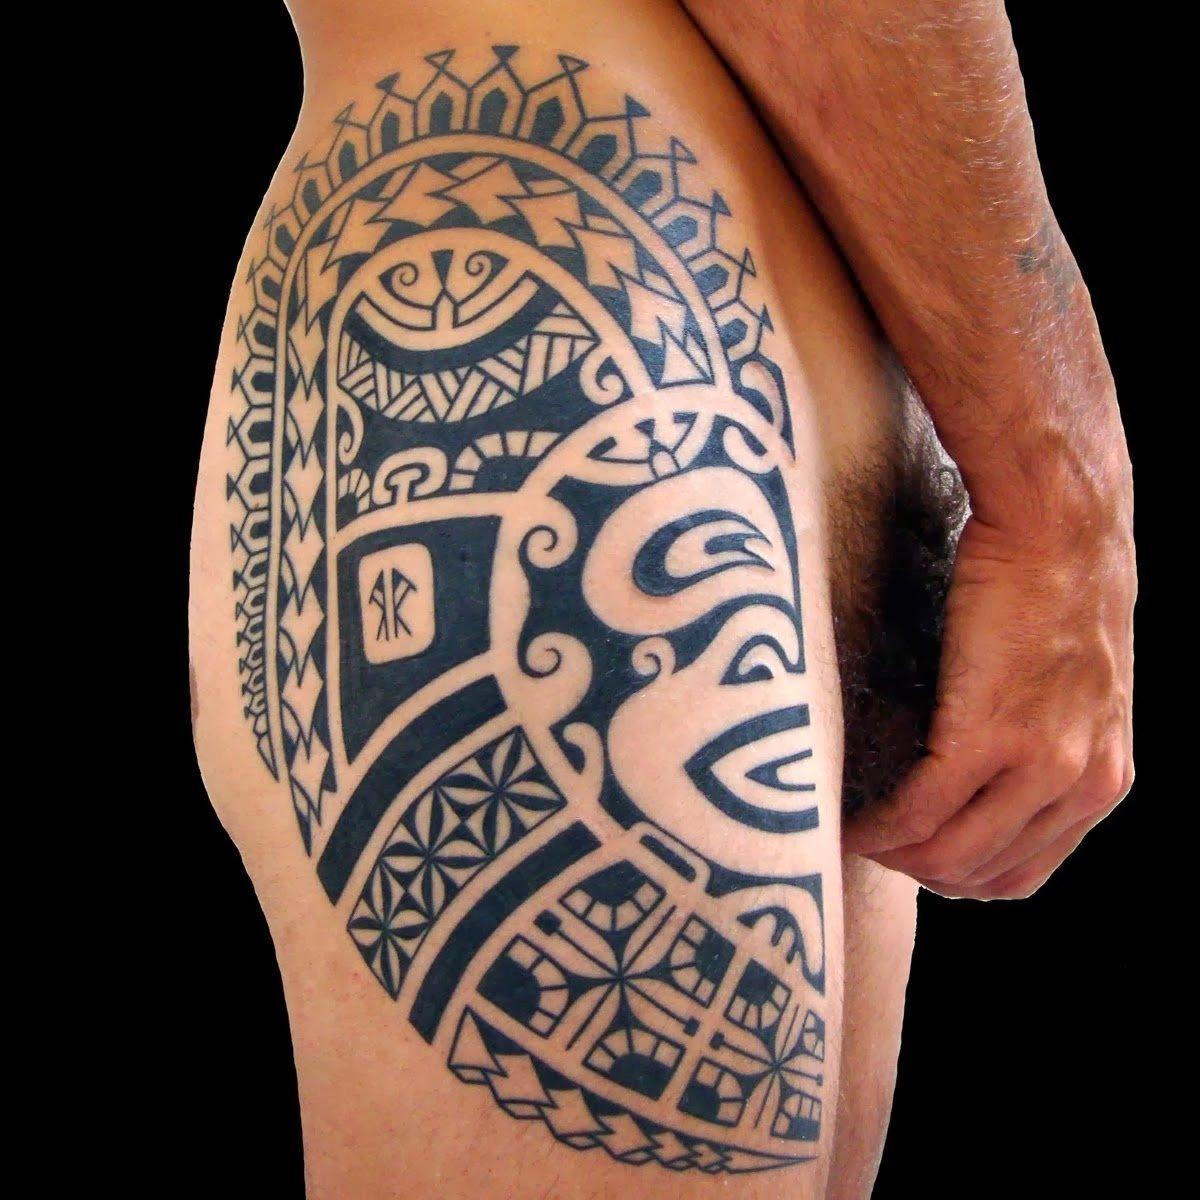 10 Unique Leg Tattoo Ideas For Men upper leg tattoo designs for men upper hand name style tattoo 1 2020